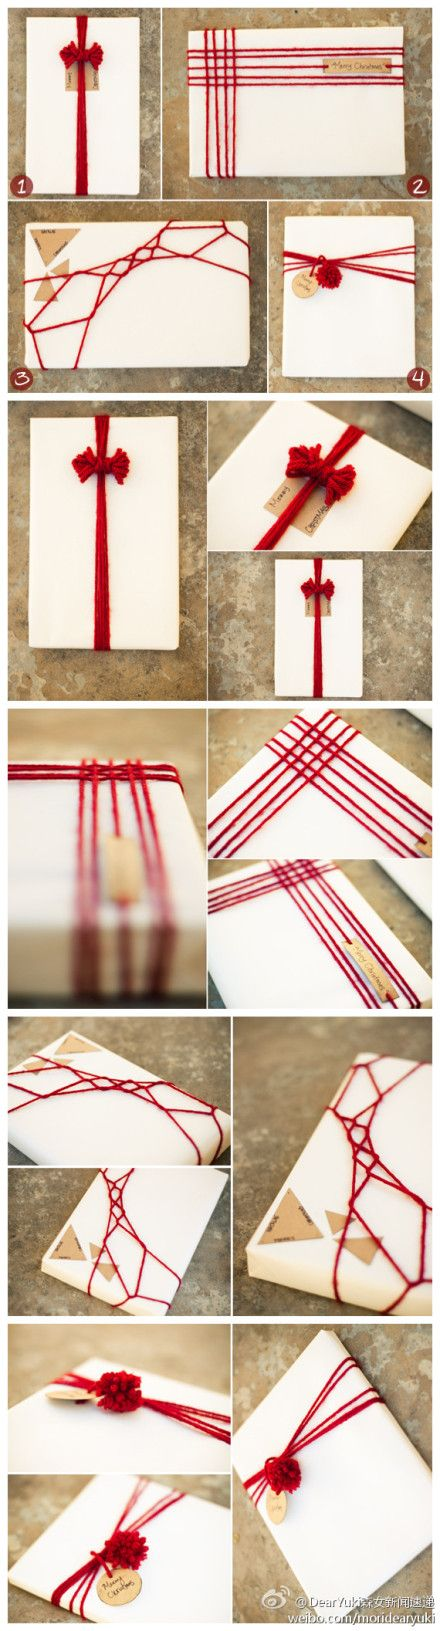 DIY Creative Ways to Gift Wrap Using a Ball of Yarn # ...